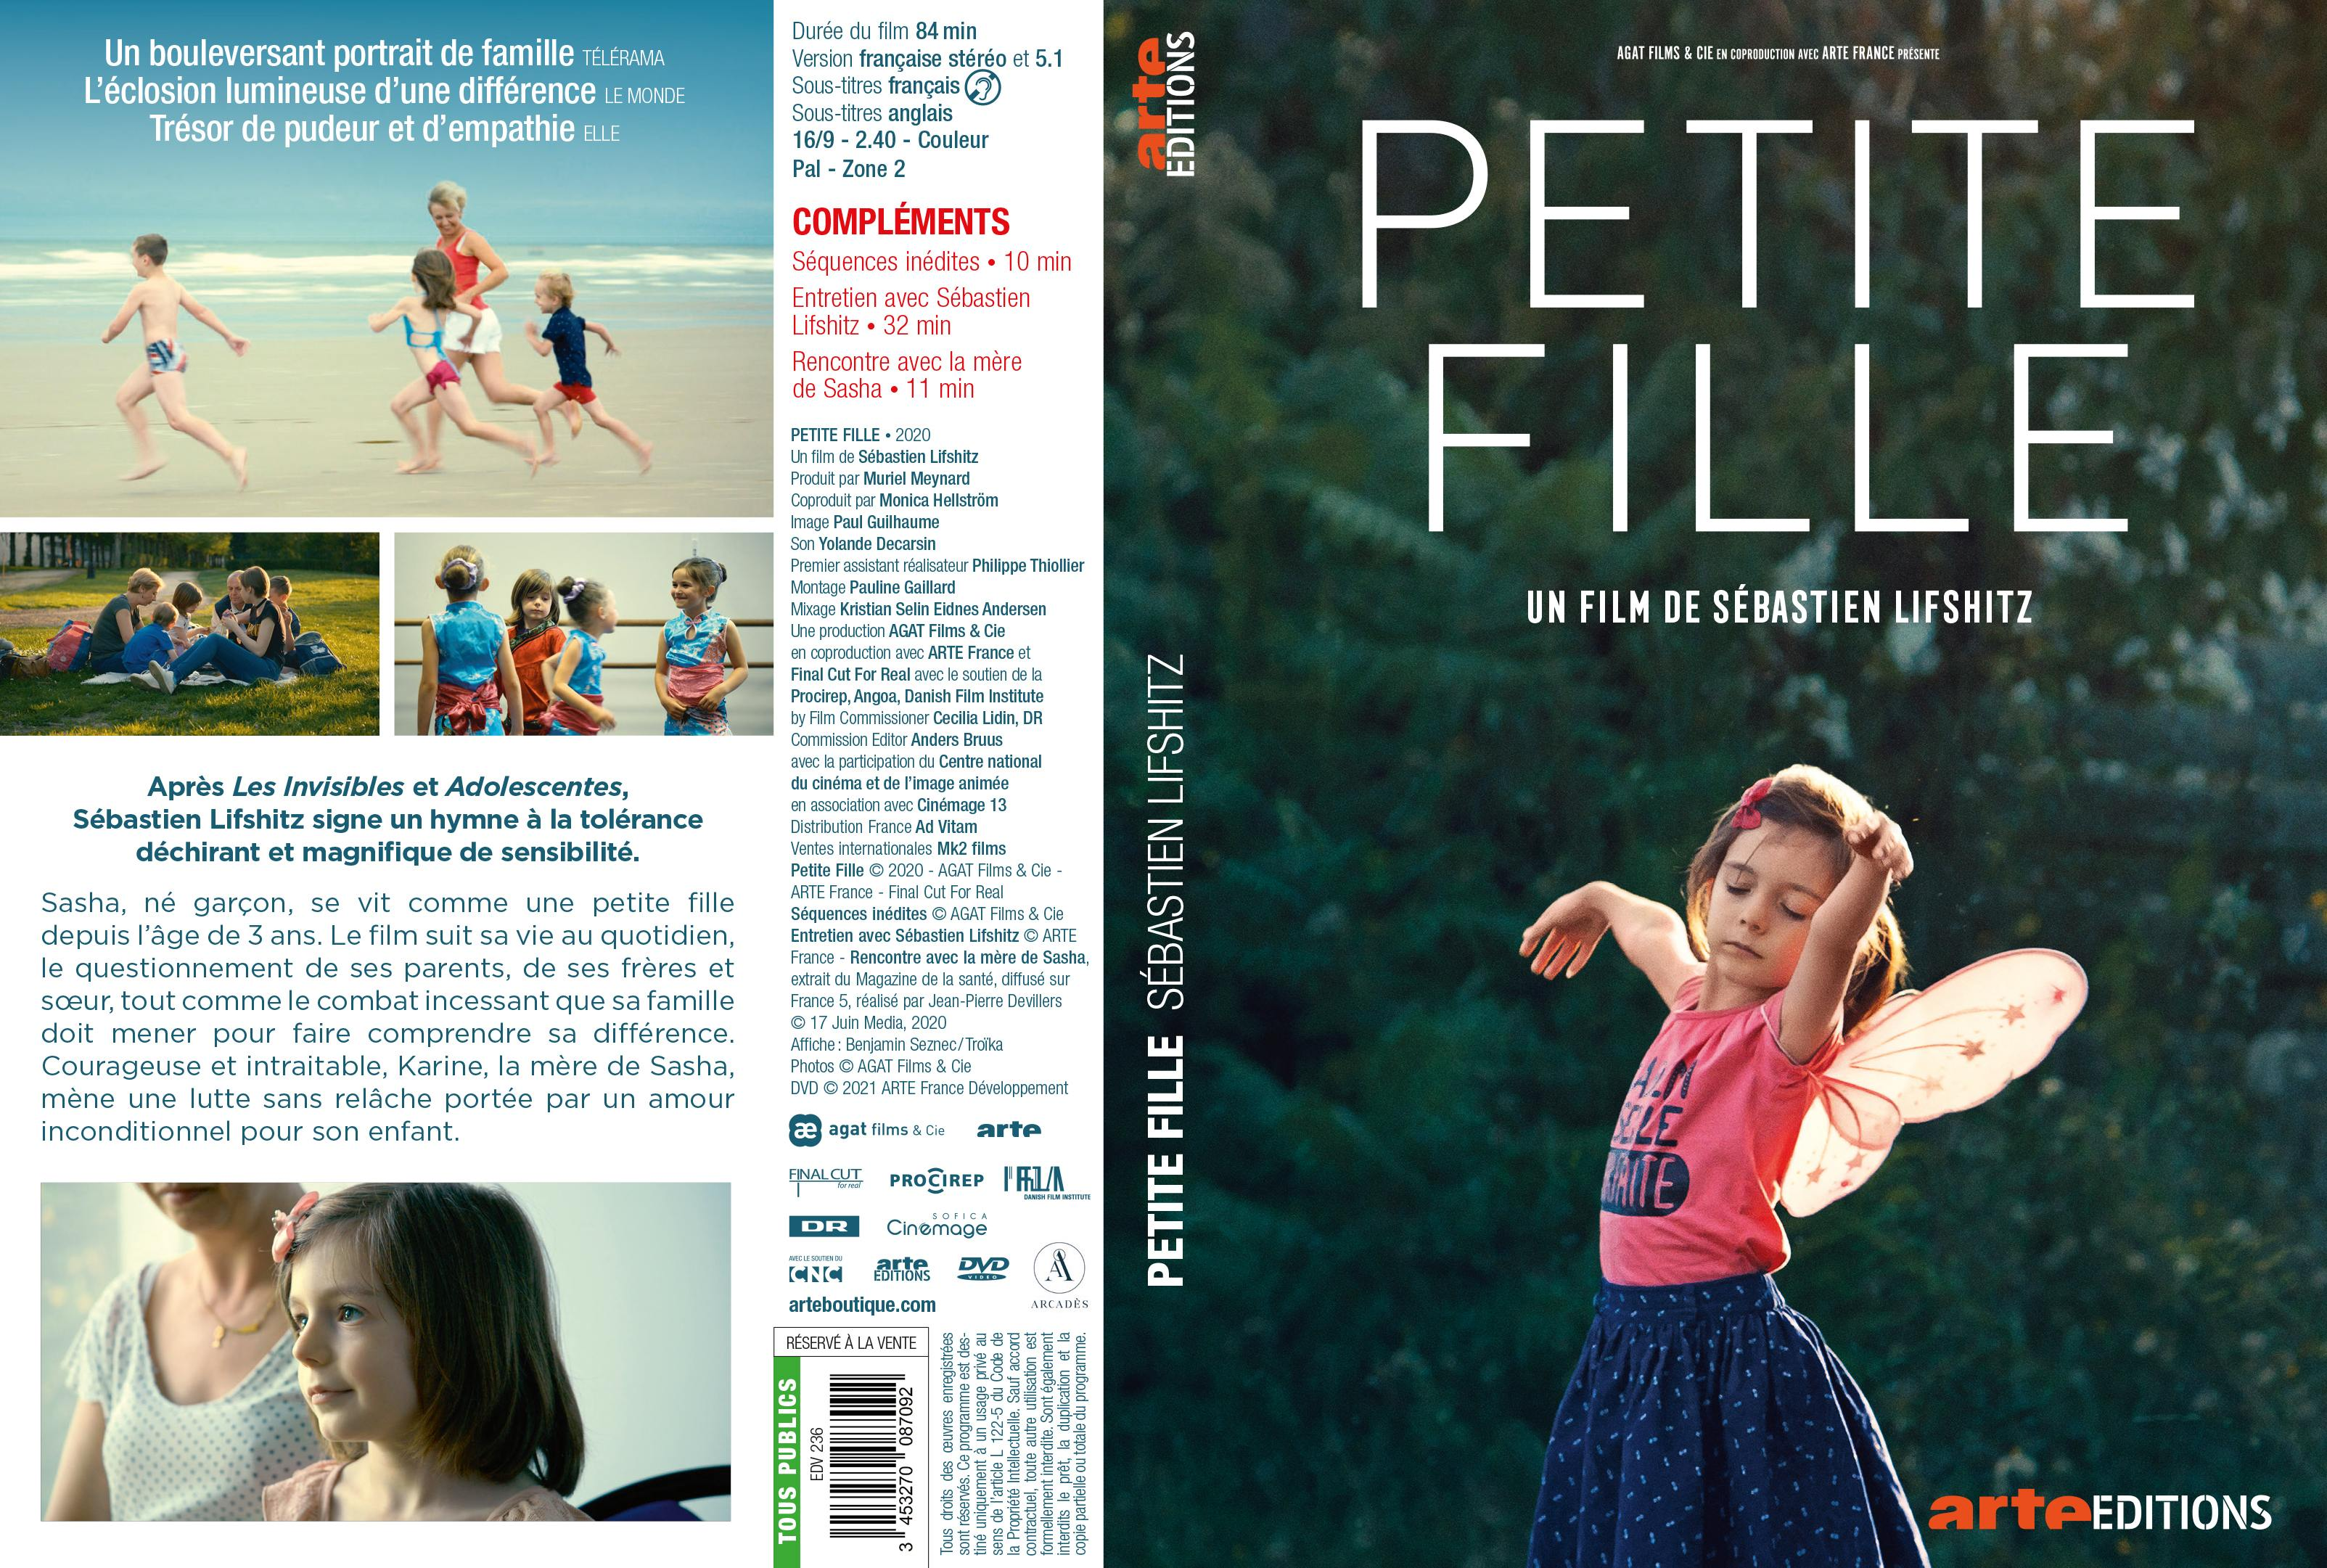 Petite fille - dvd